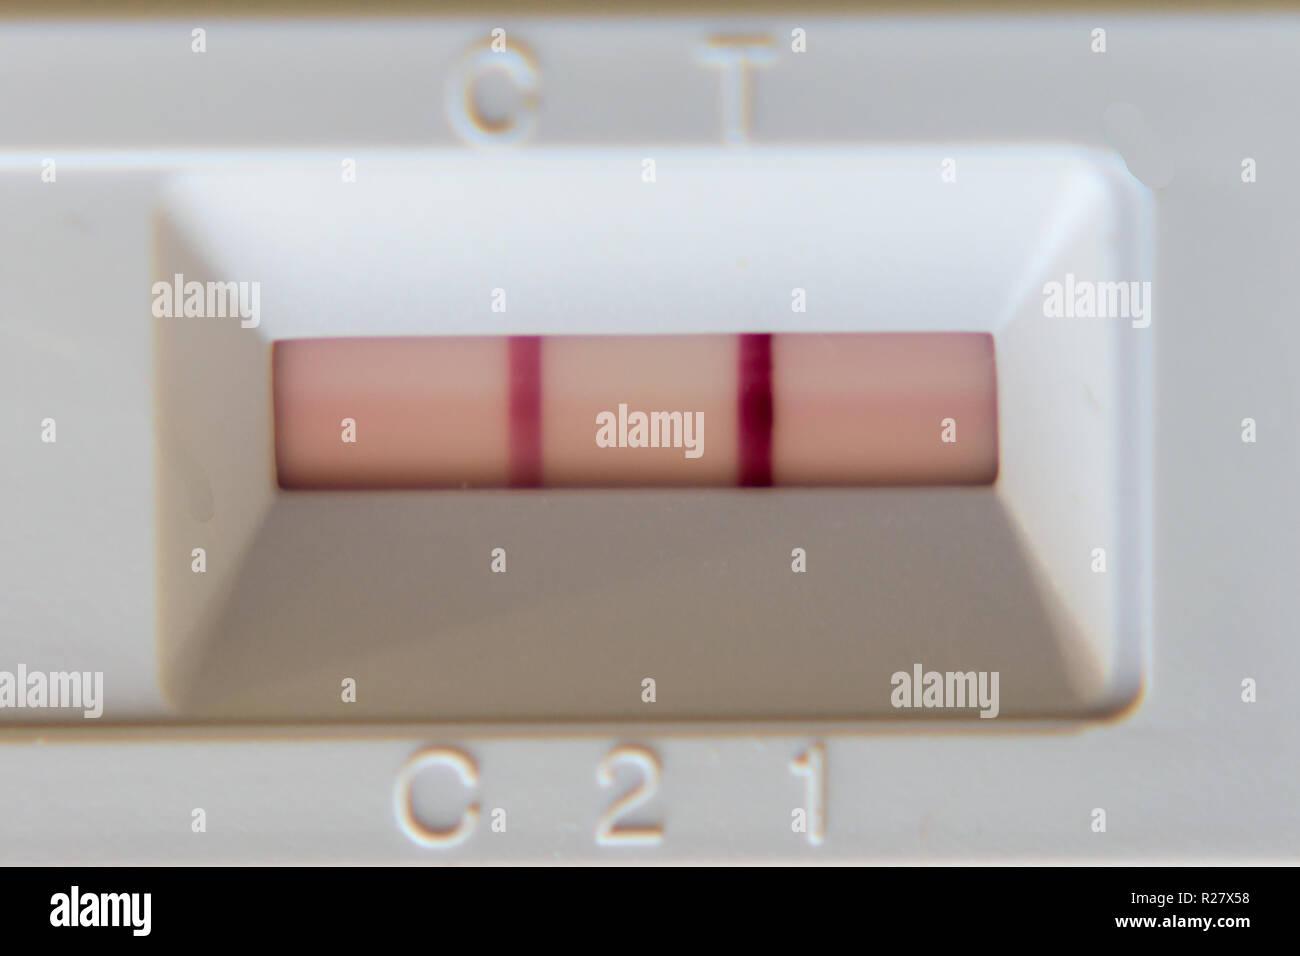 Positiv test rápido. Dos líneas rojas. Imagen De Stock